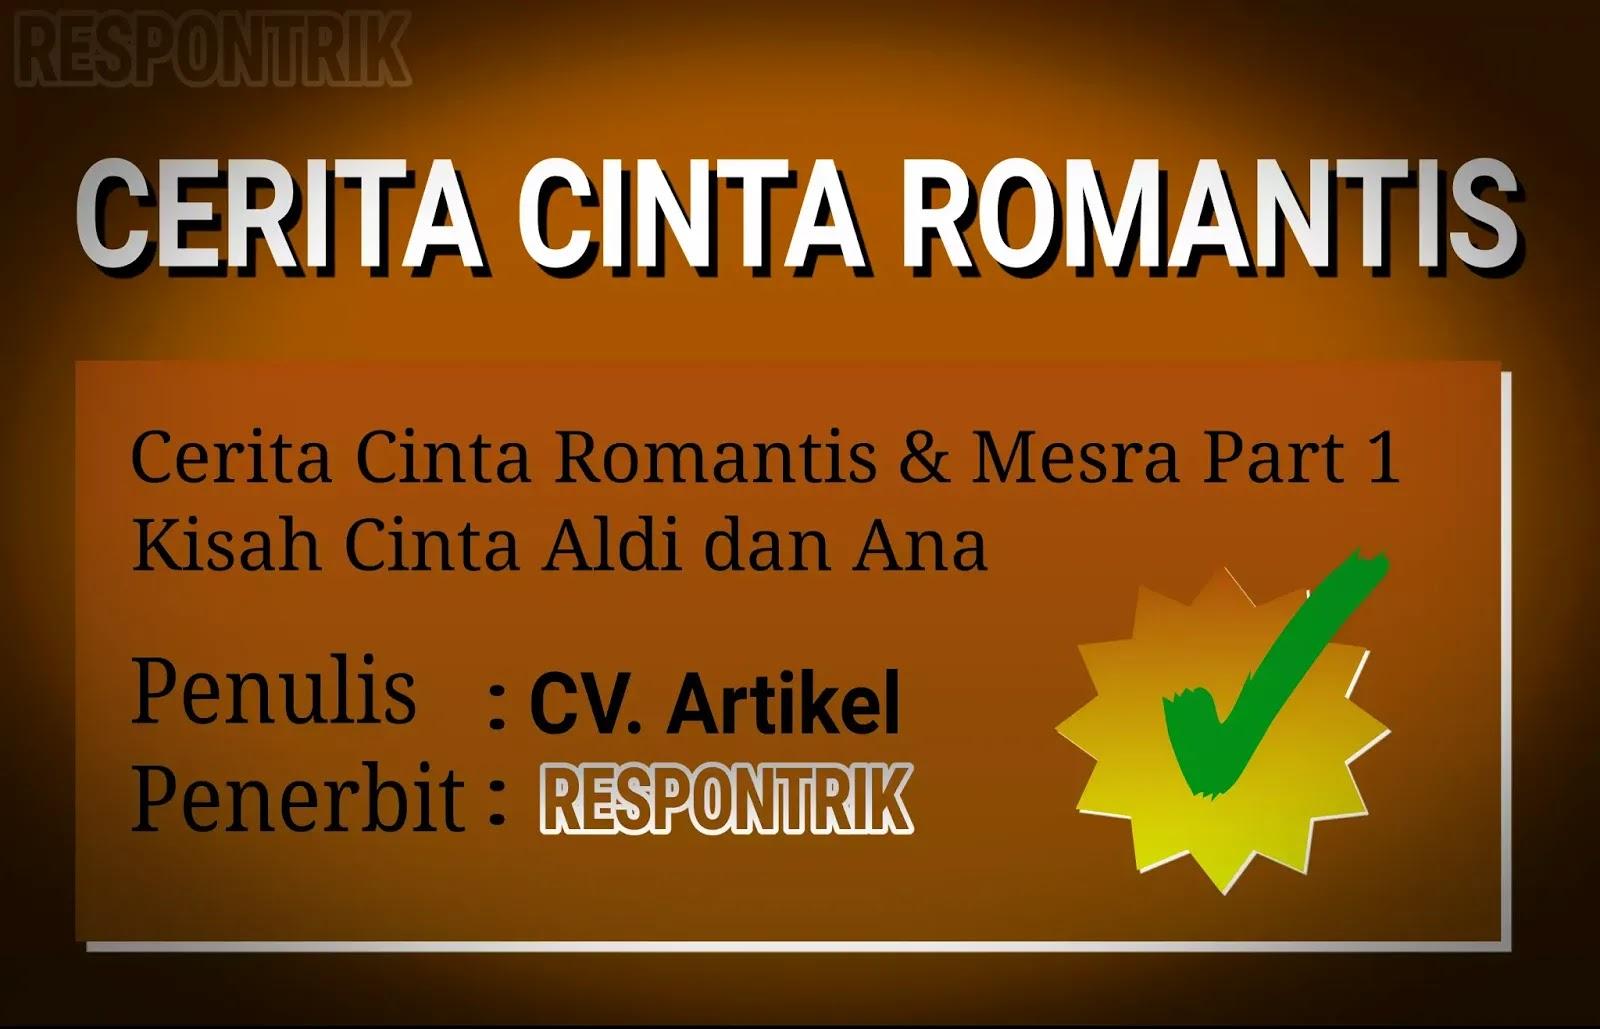 Cerita dewasa cerita cinta romantis 21+ (bahasa indonesia lengkap)